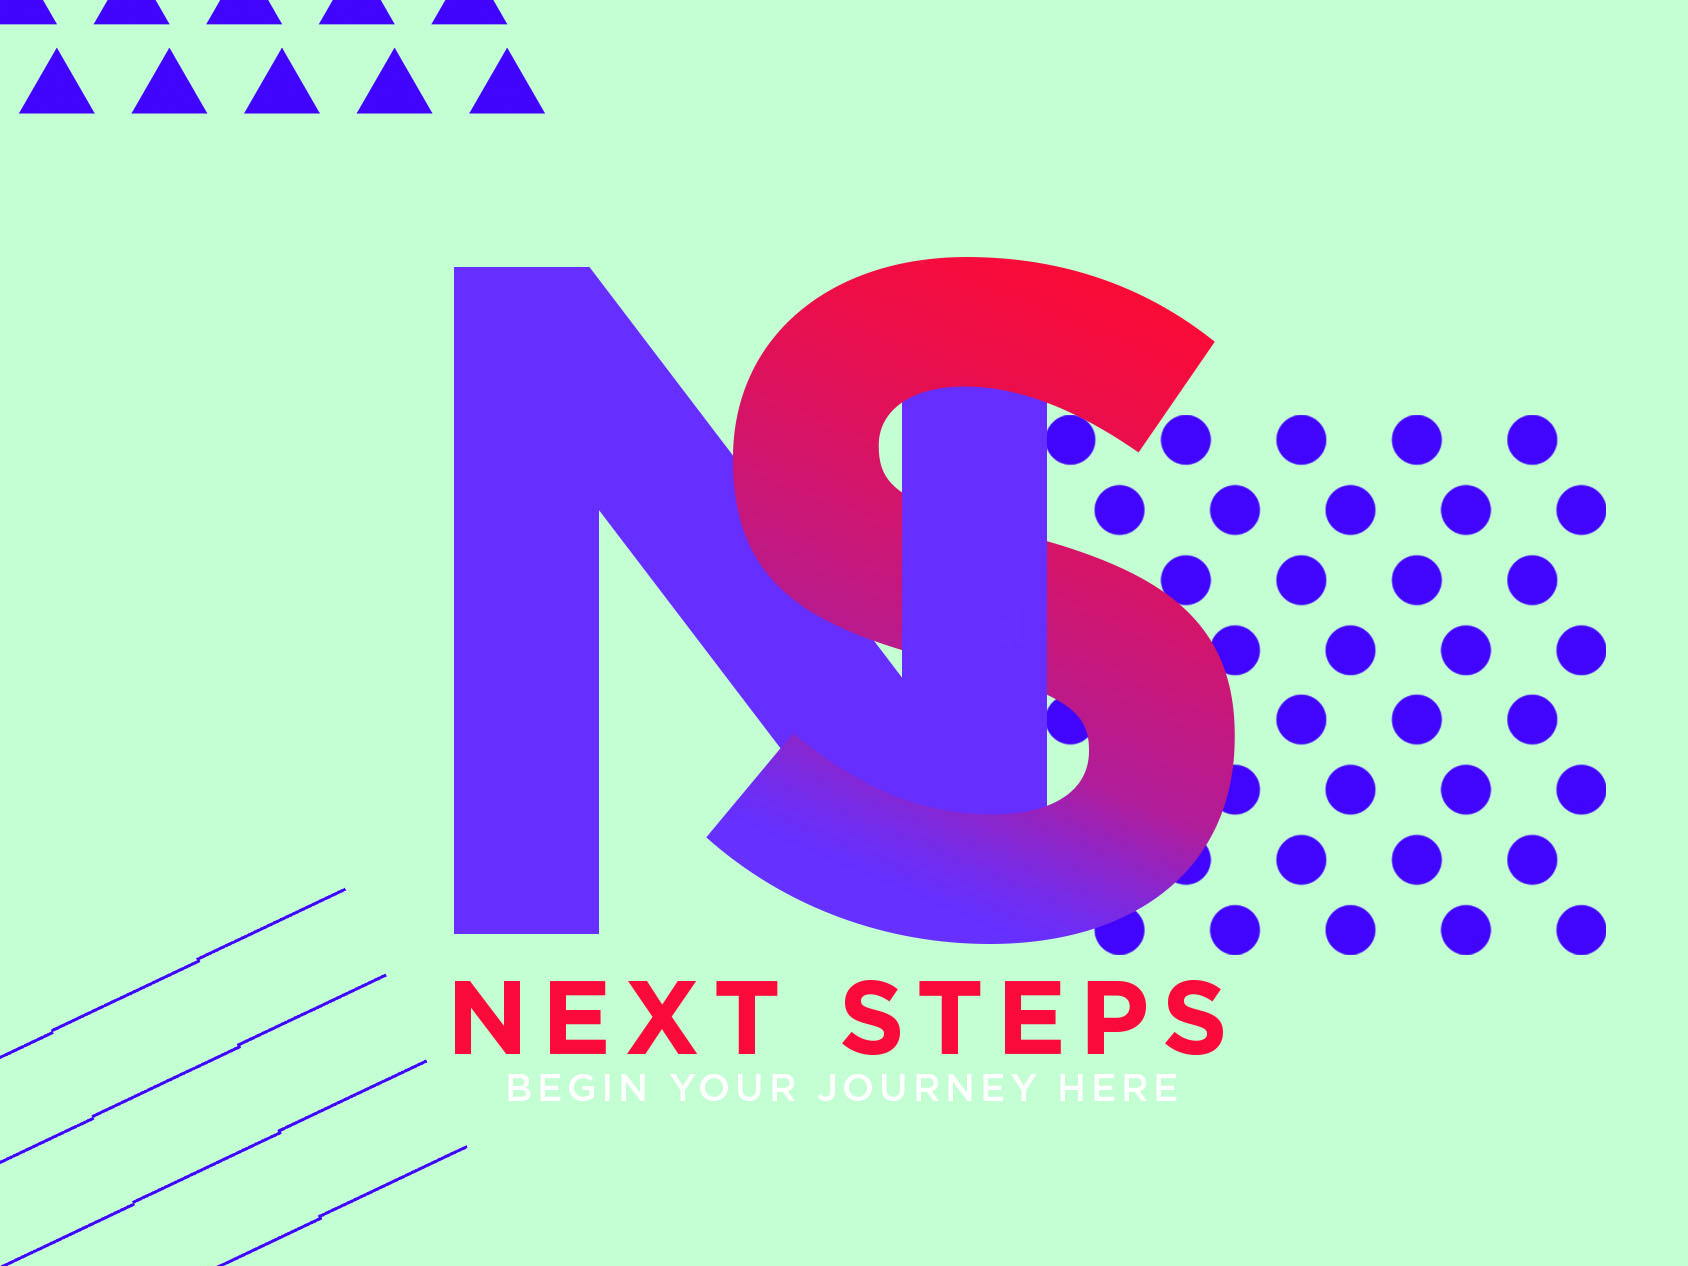 Next steps flyer front